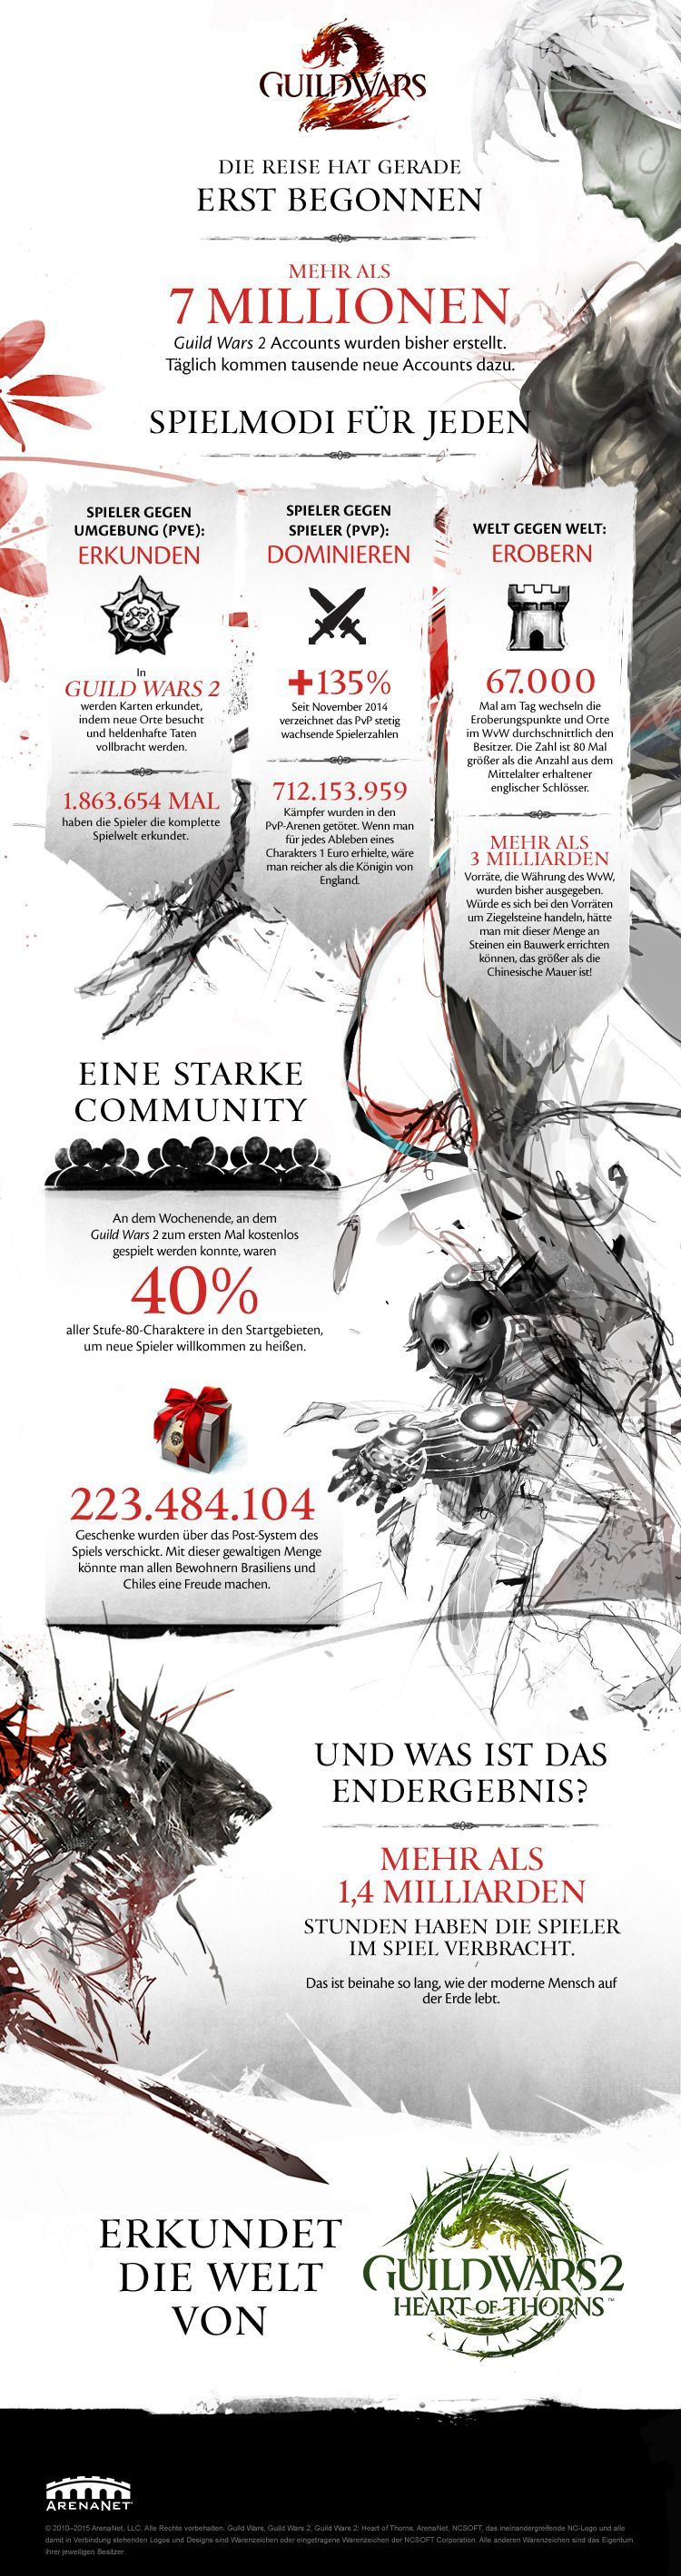 Guild Wars 2 Heart of Thorns Infografik